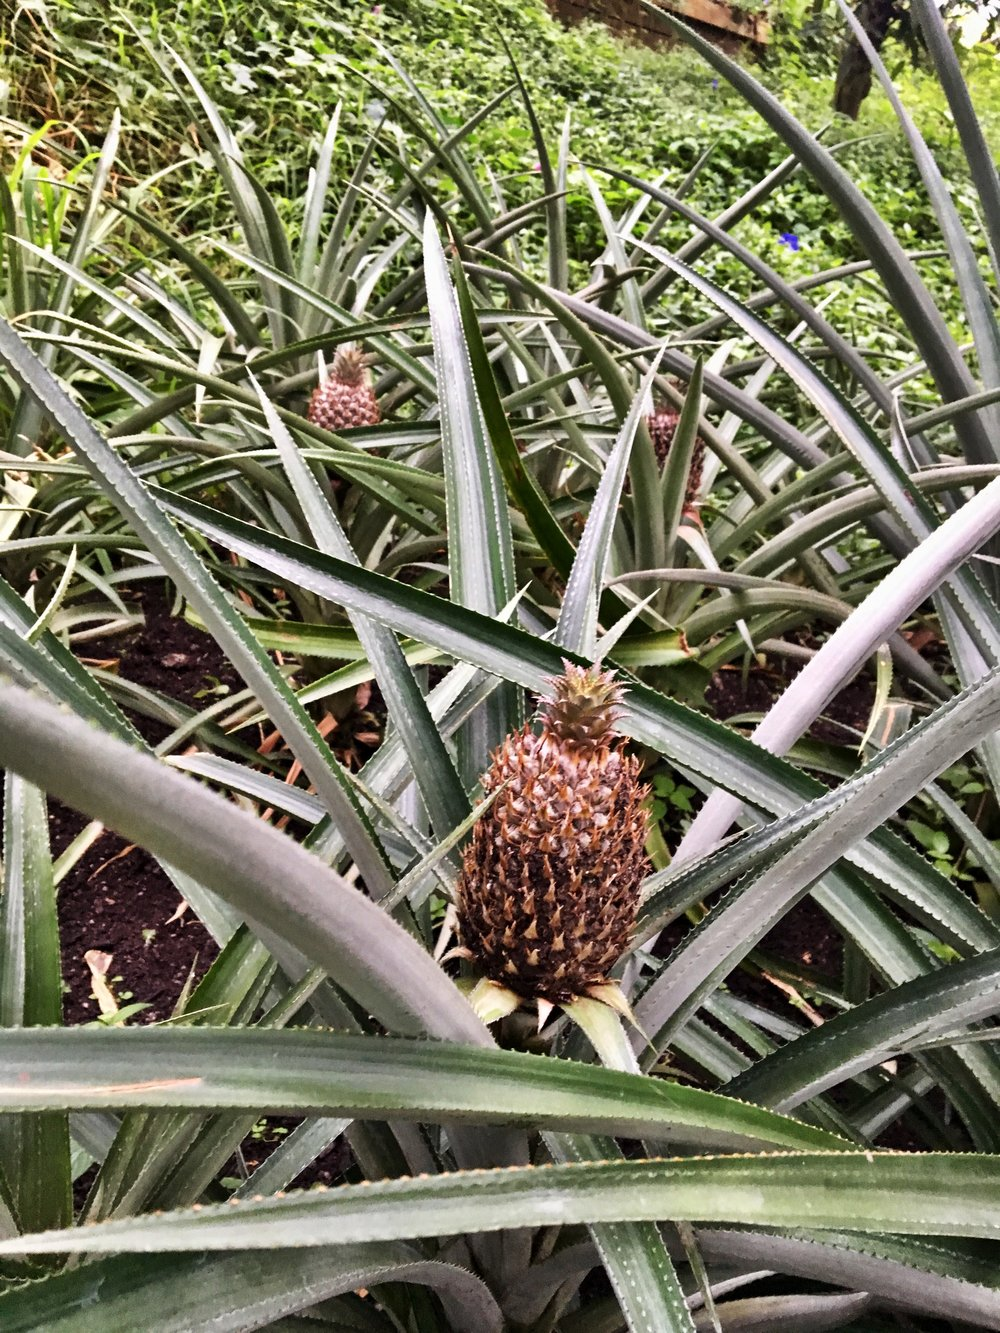 Pineapple plant, Eden Project (November 2016)